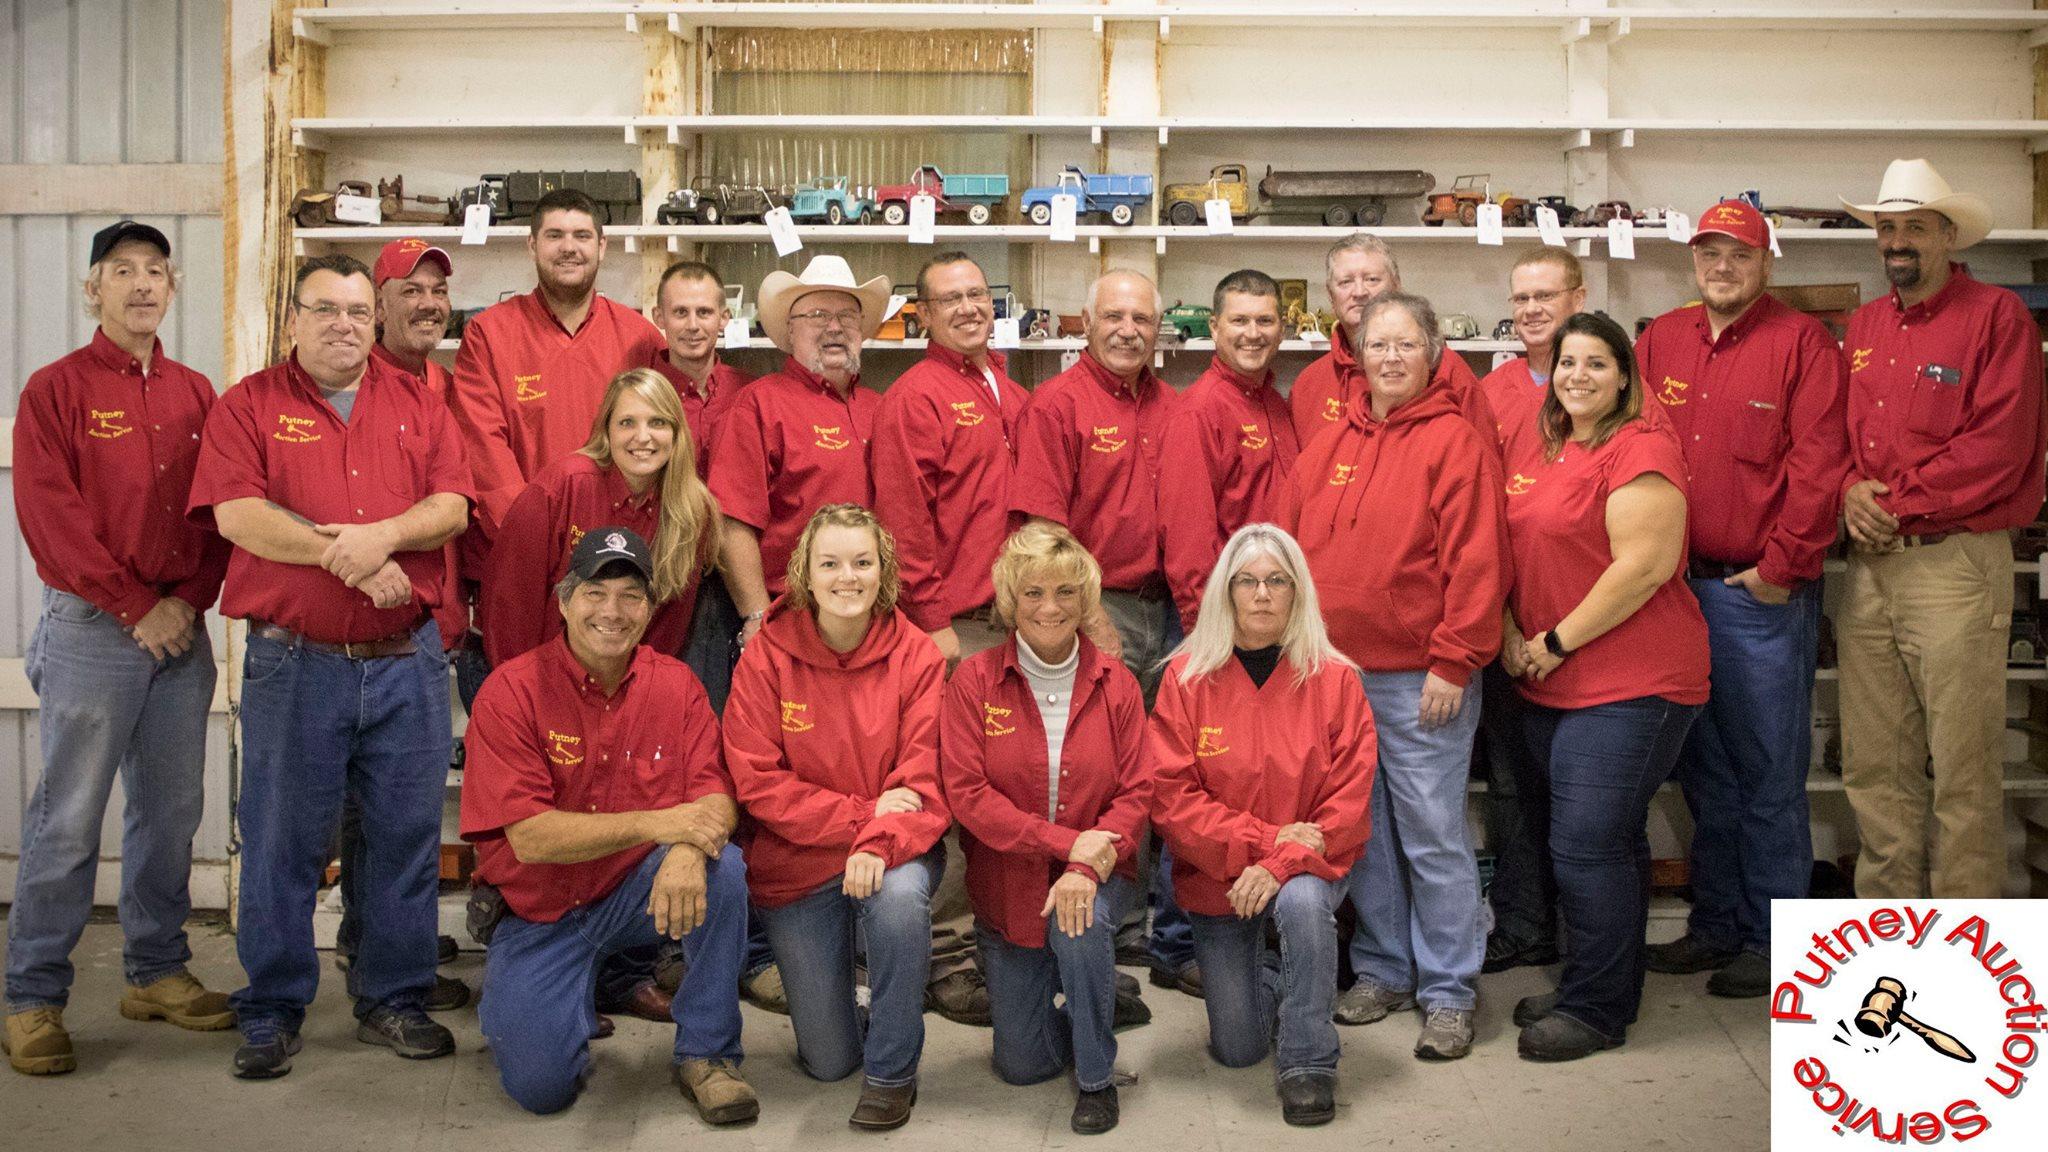 Putney Auction Service team photo